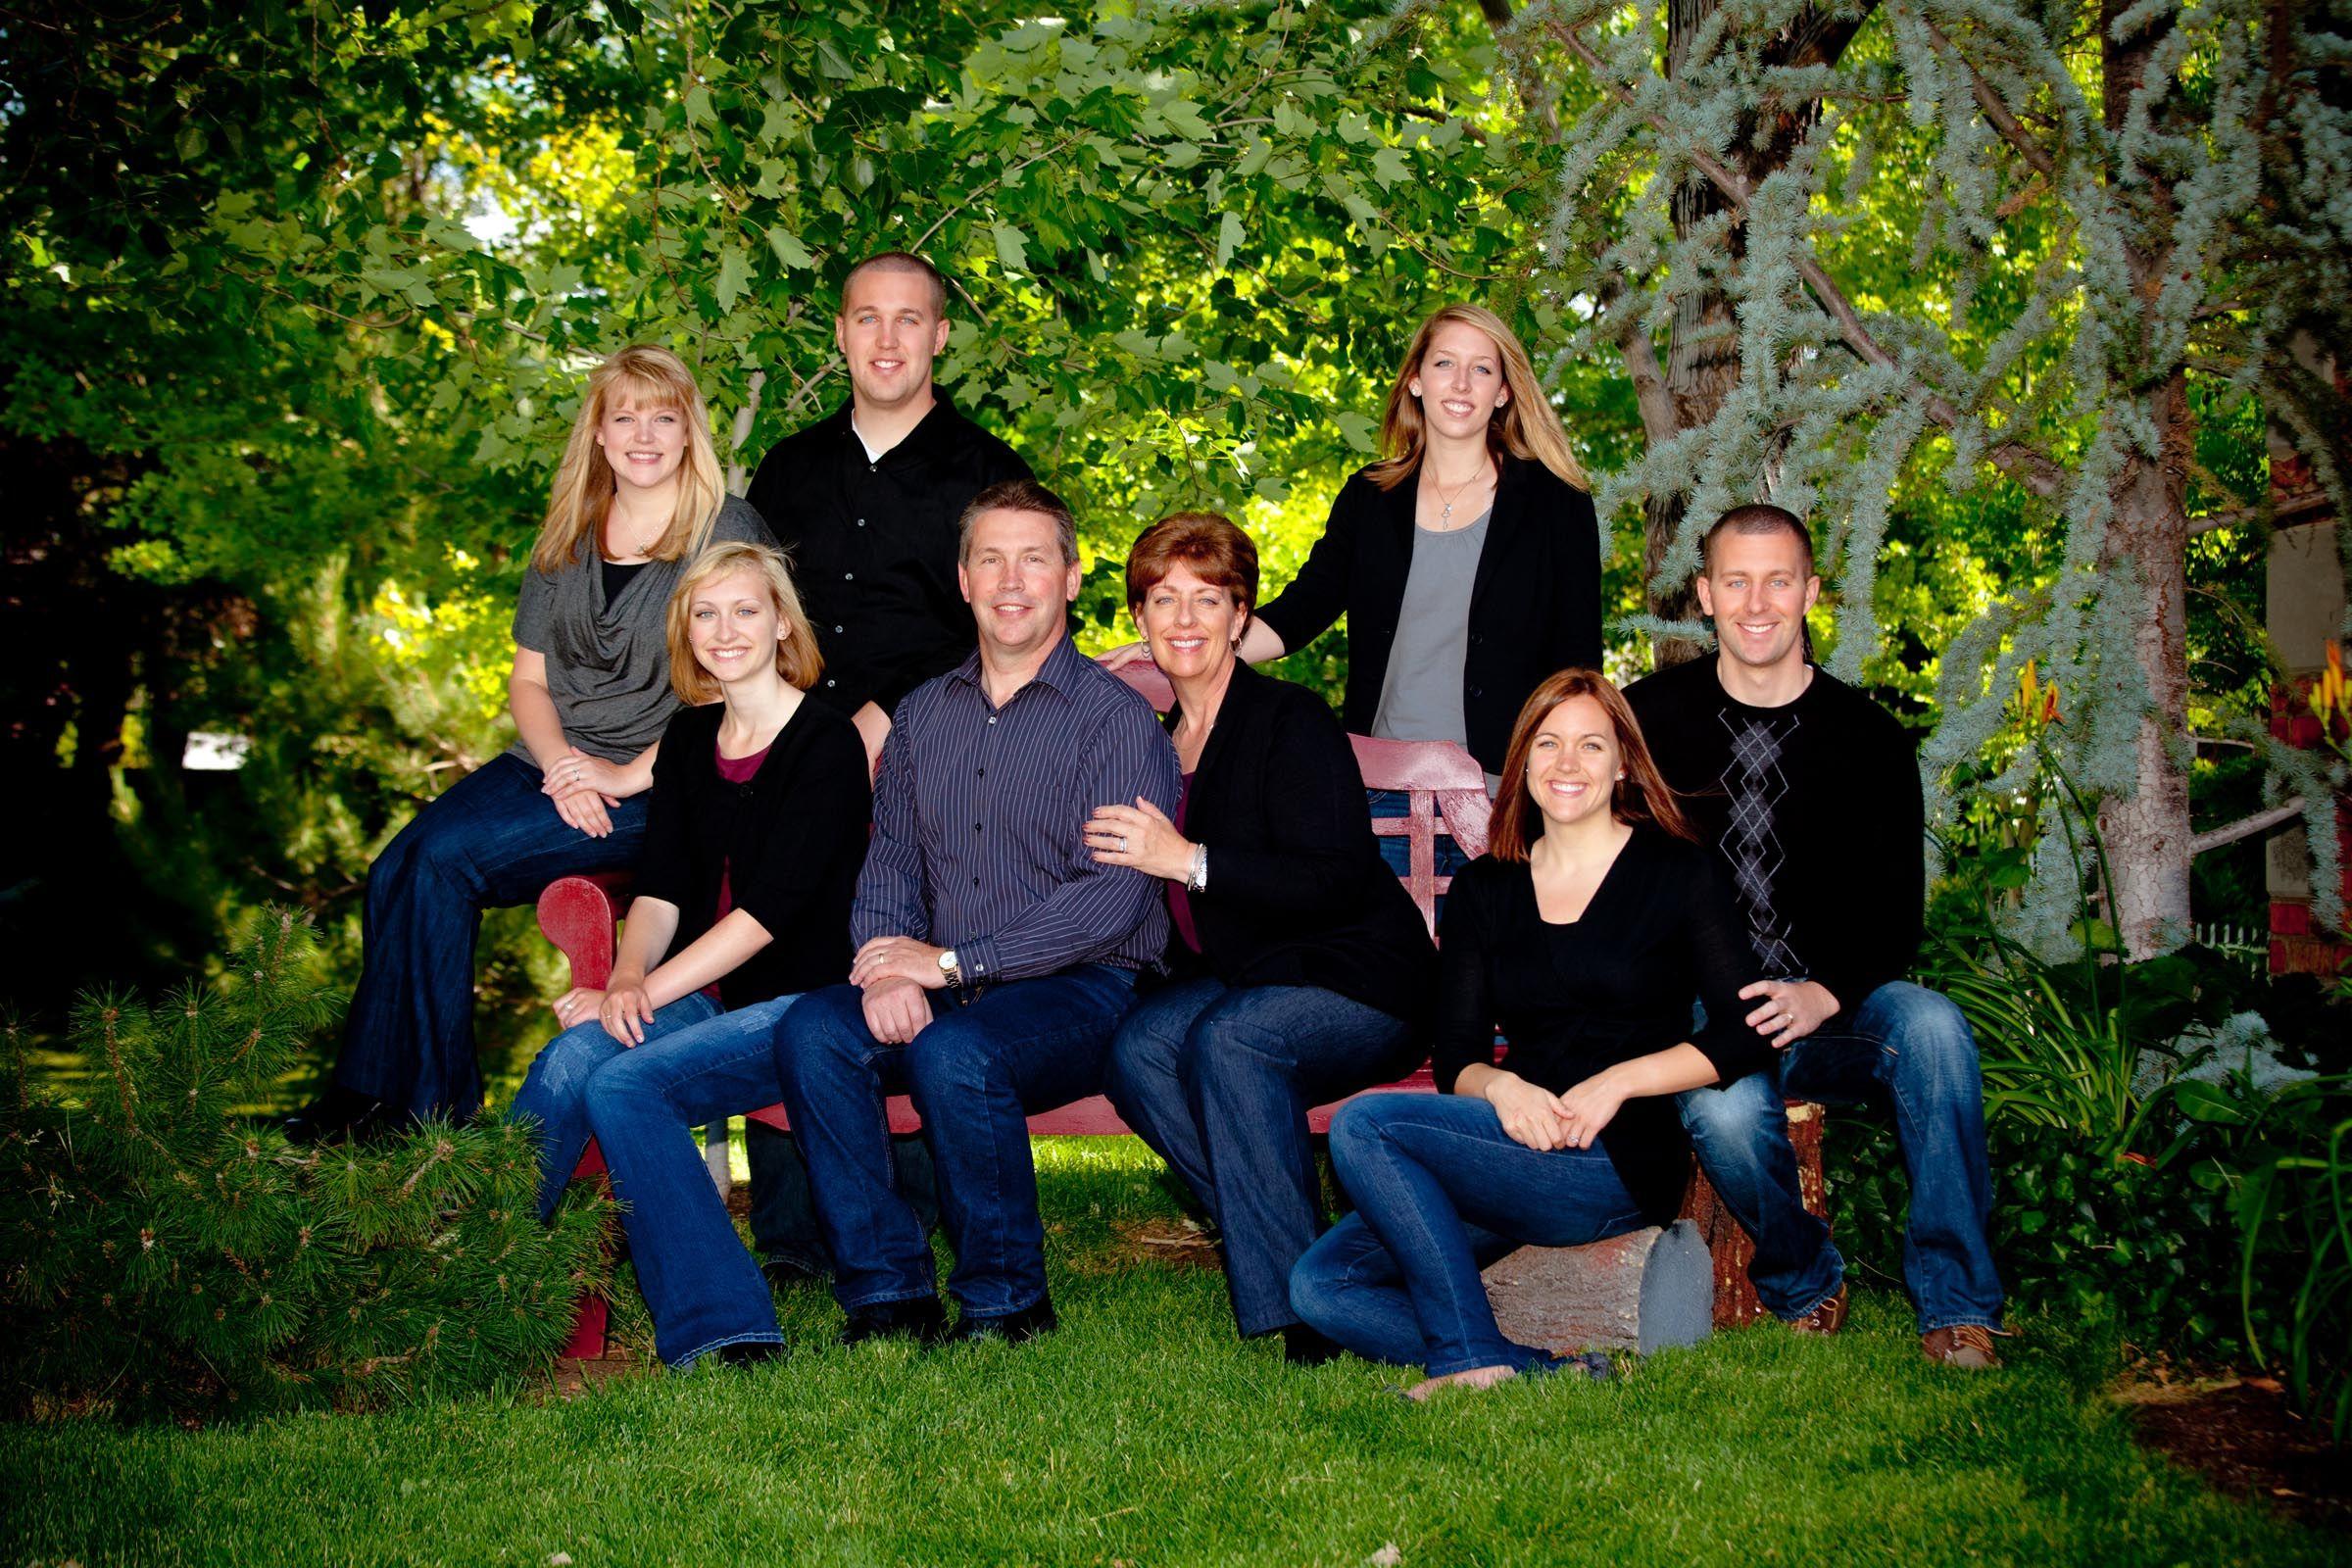 Family Photo Ideas 35 Stupendous Picture Slodive